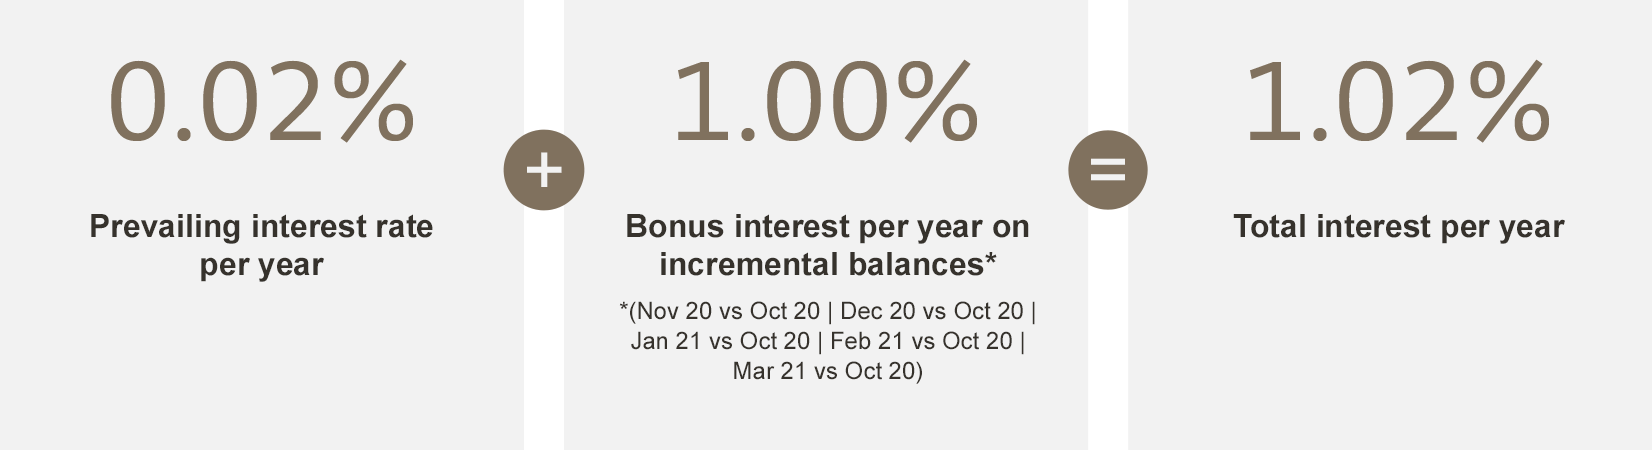 Ocbc daily forex rate - blogger.com